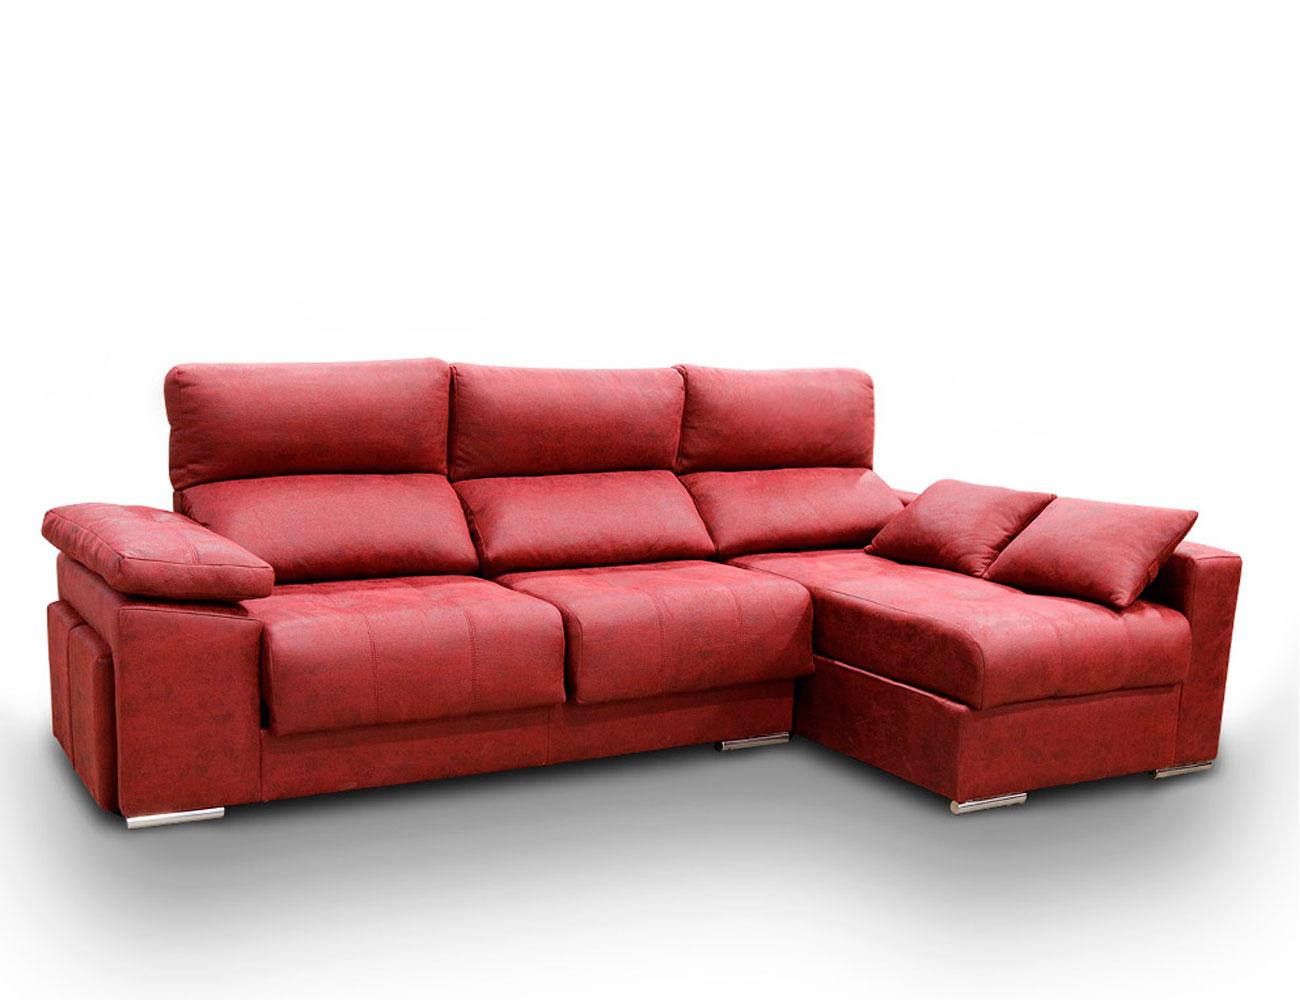 Sofa chaiselongue anti manchas rojo granate21